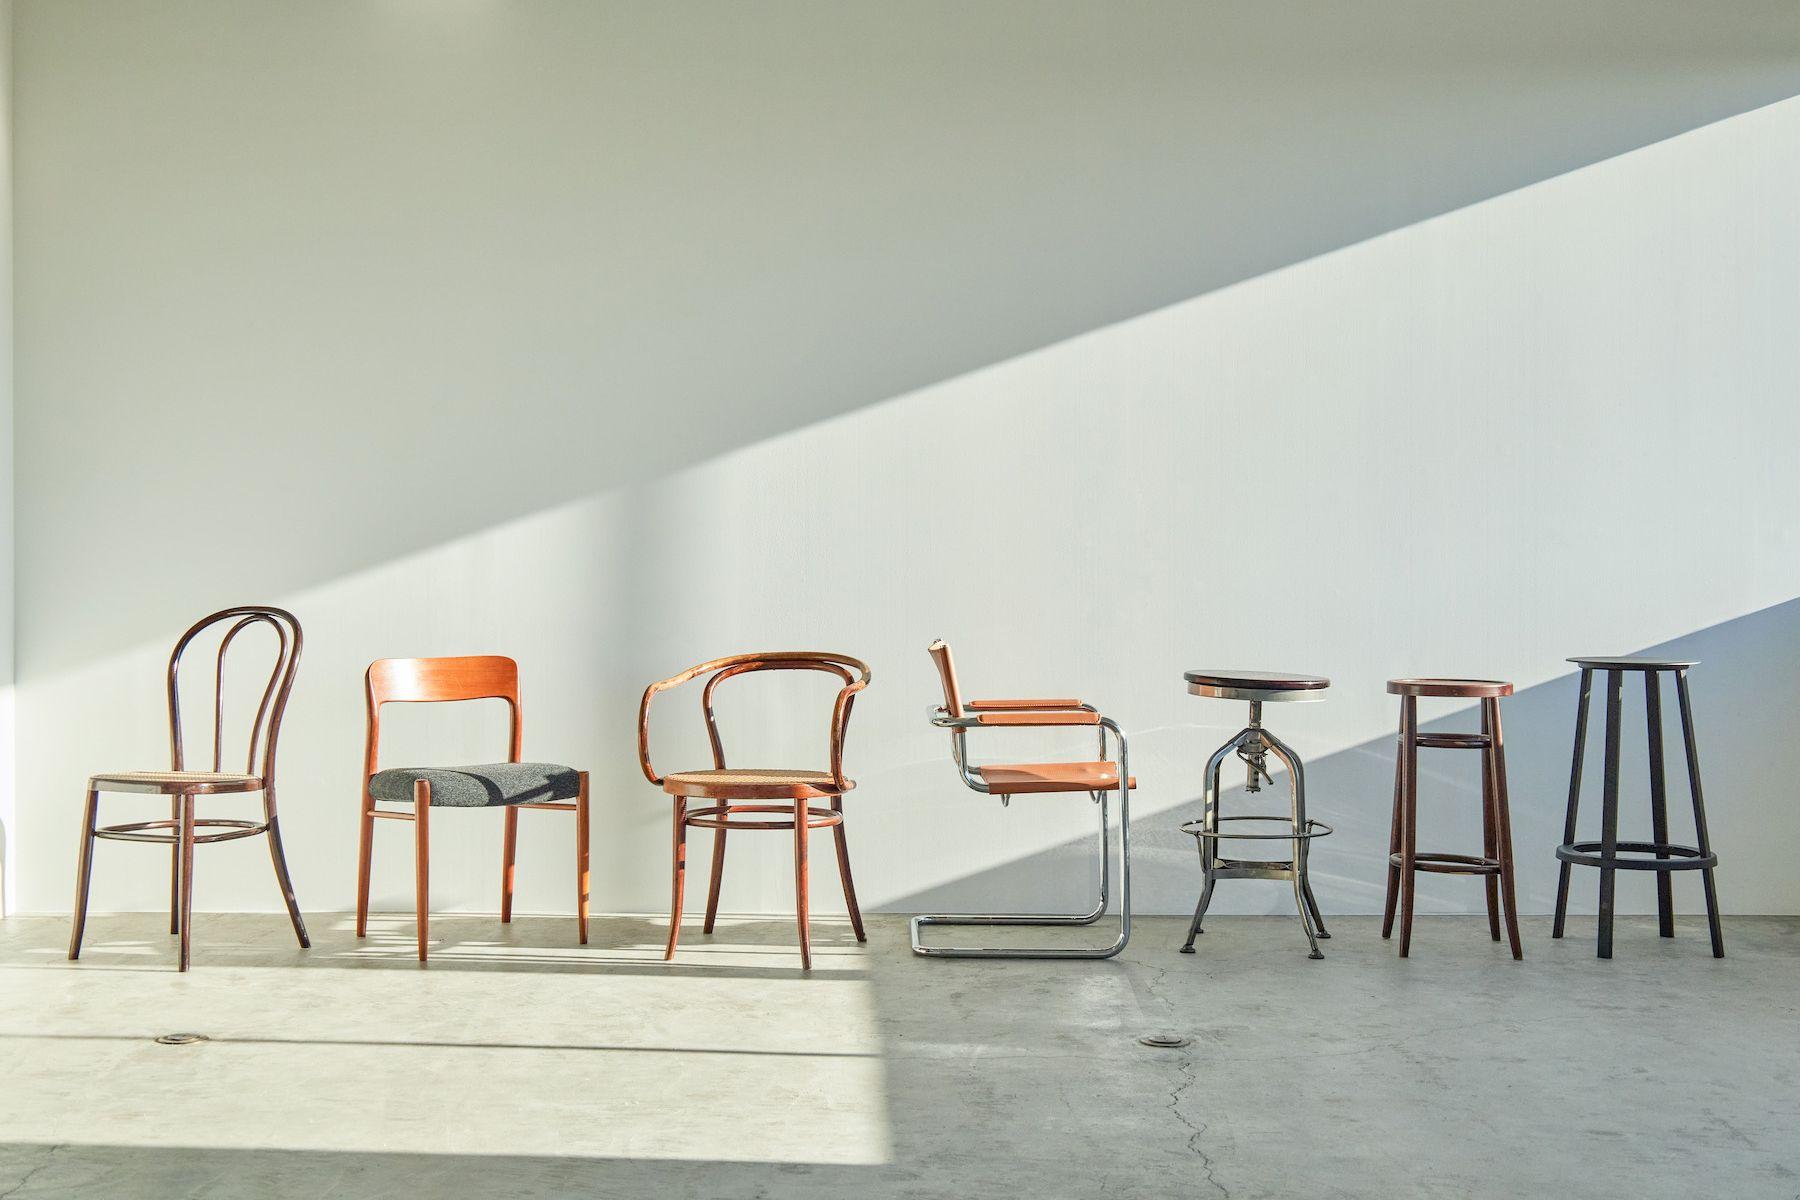 Inspiration studio (インスピレーションスタジオ)名作ビンテージの椅子も充実